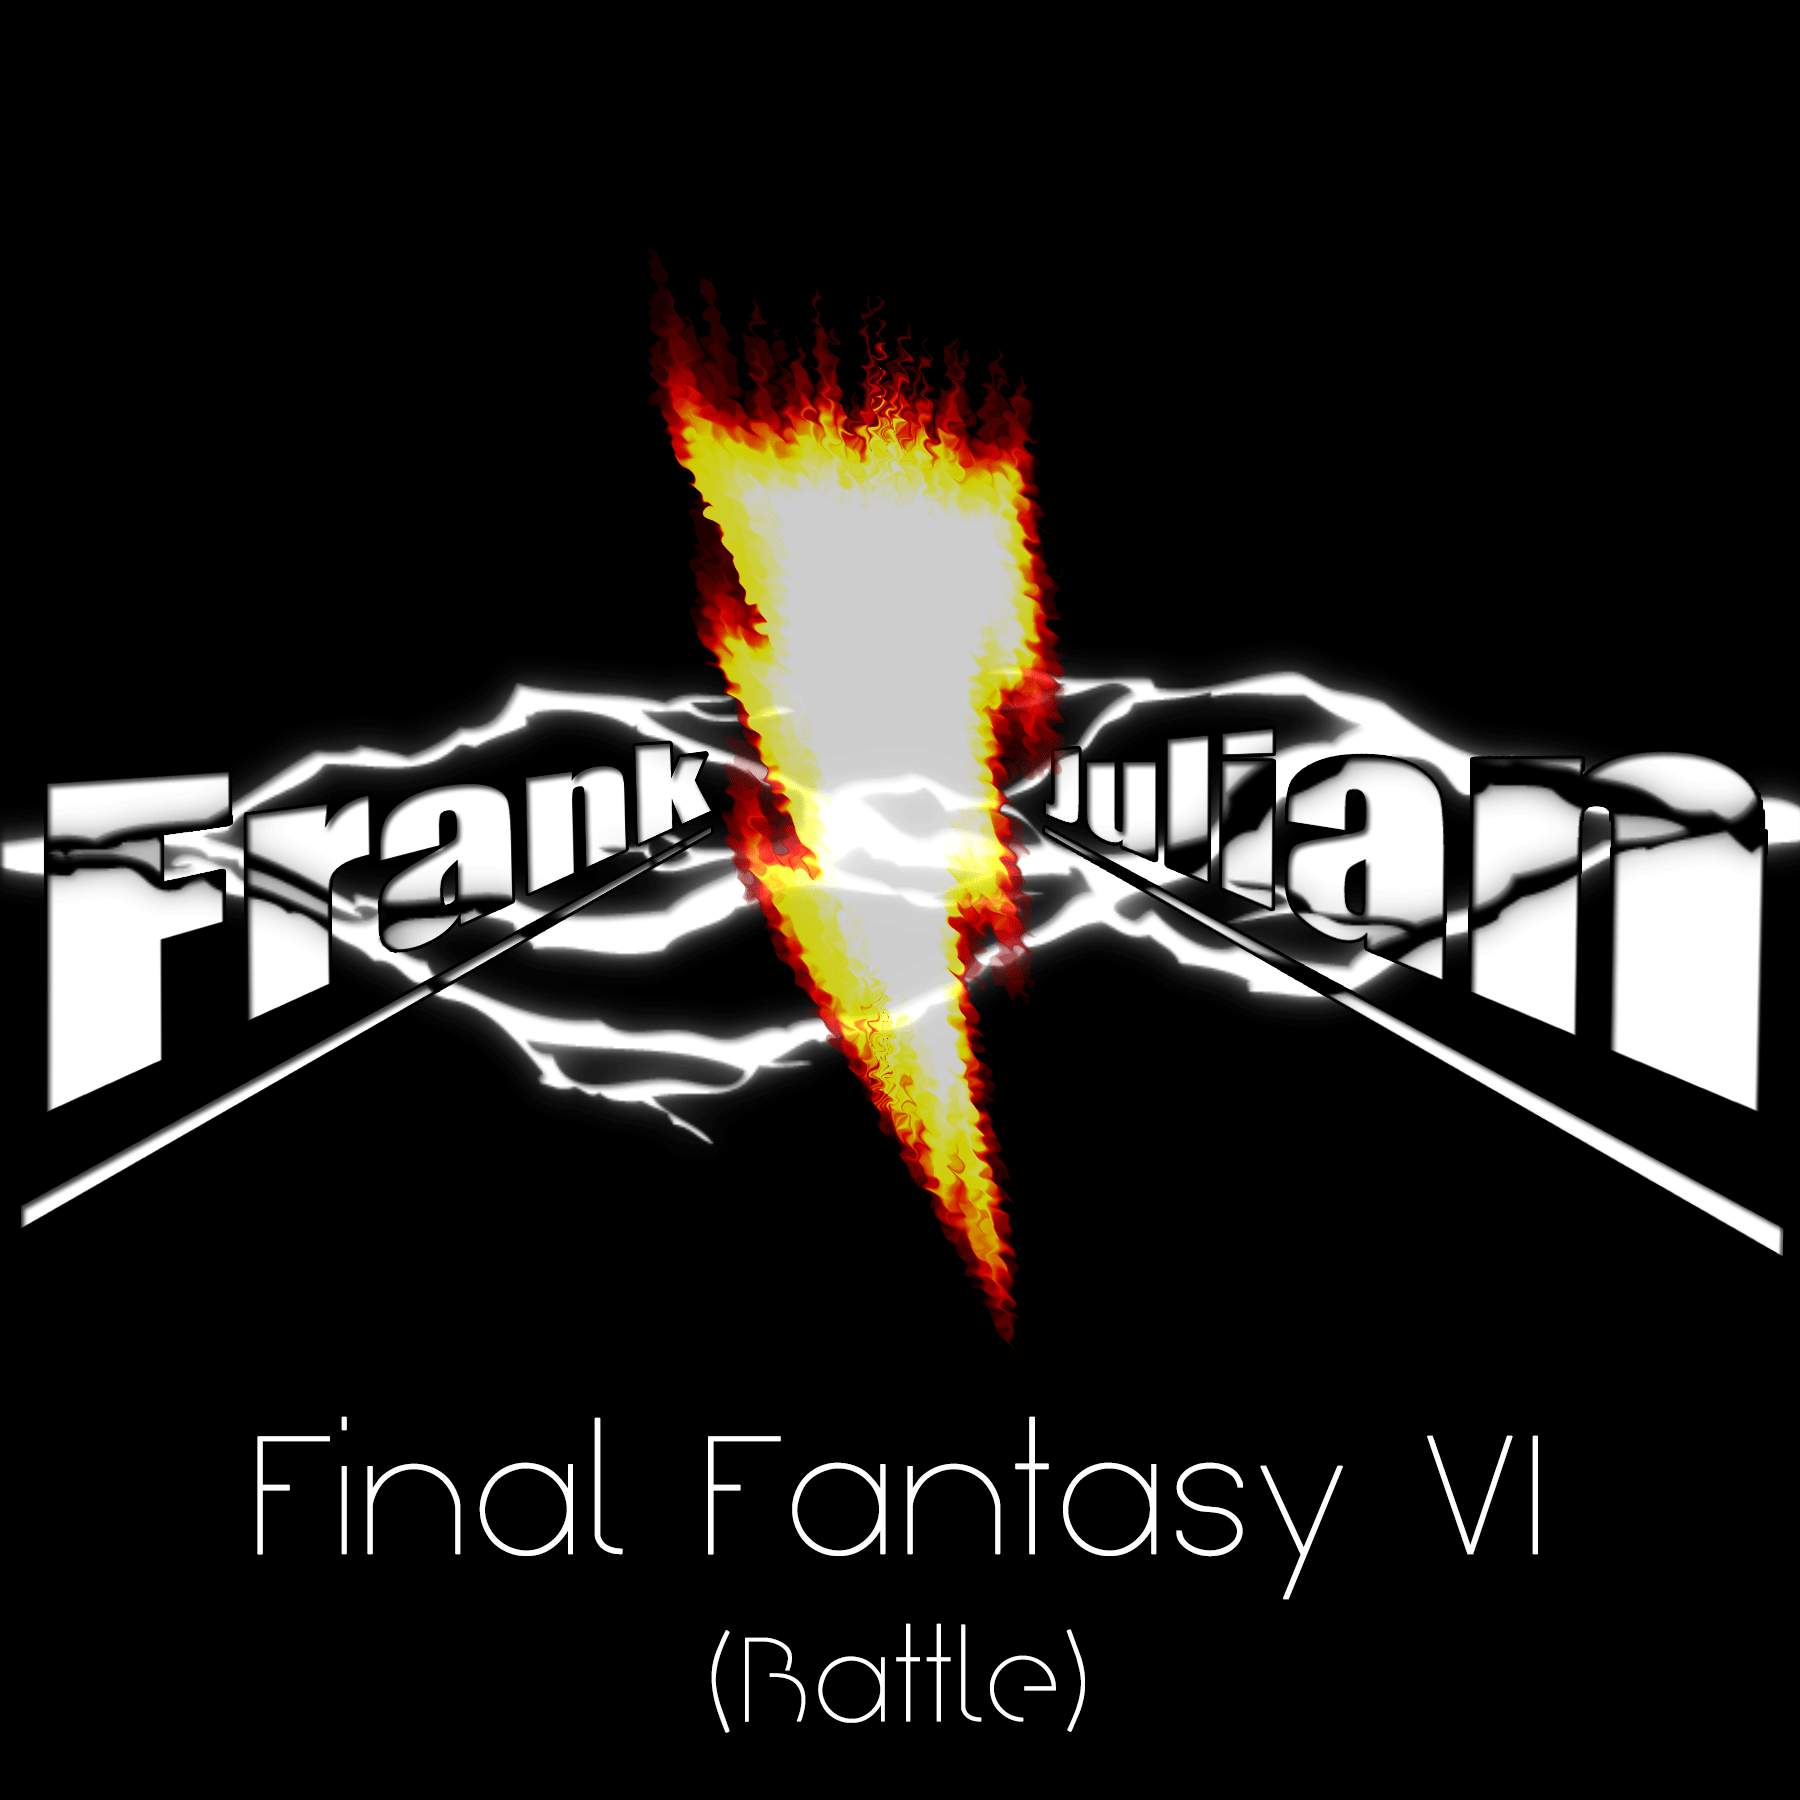 Uematsu, Nobuo: Frank Julian meets Final Fantasy VI: Battle (SNES Main Theme Metal Cover)